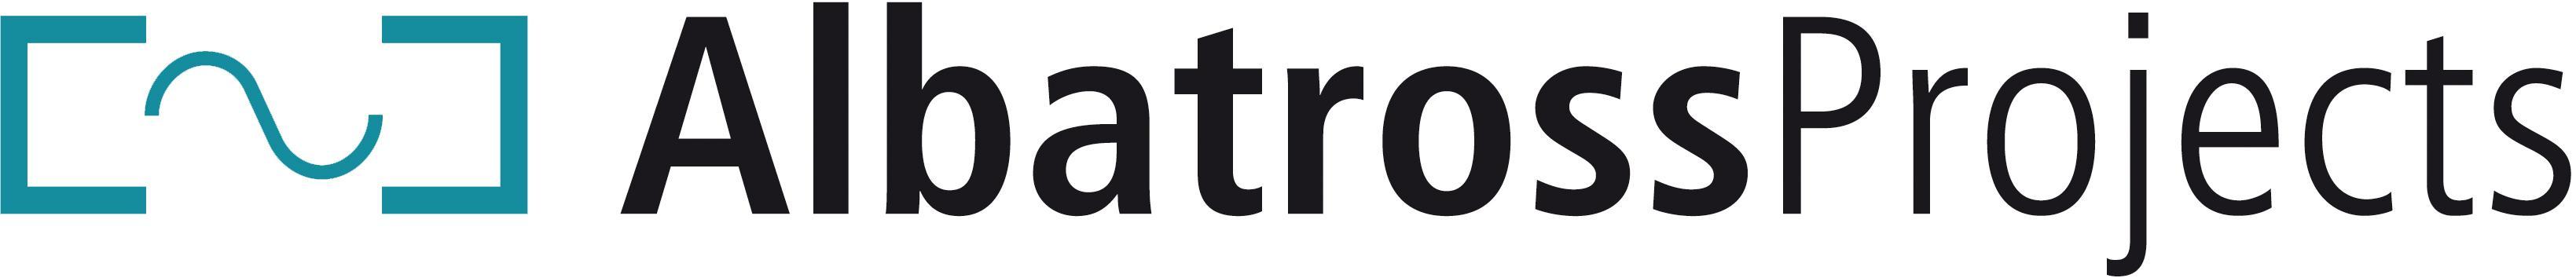 Albatross Projects GmbH